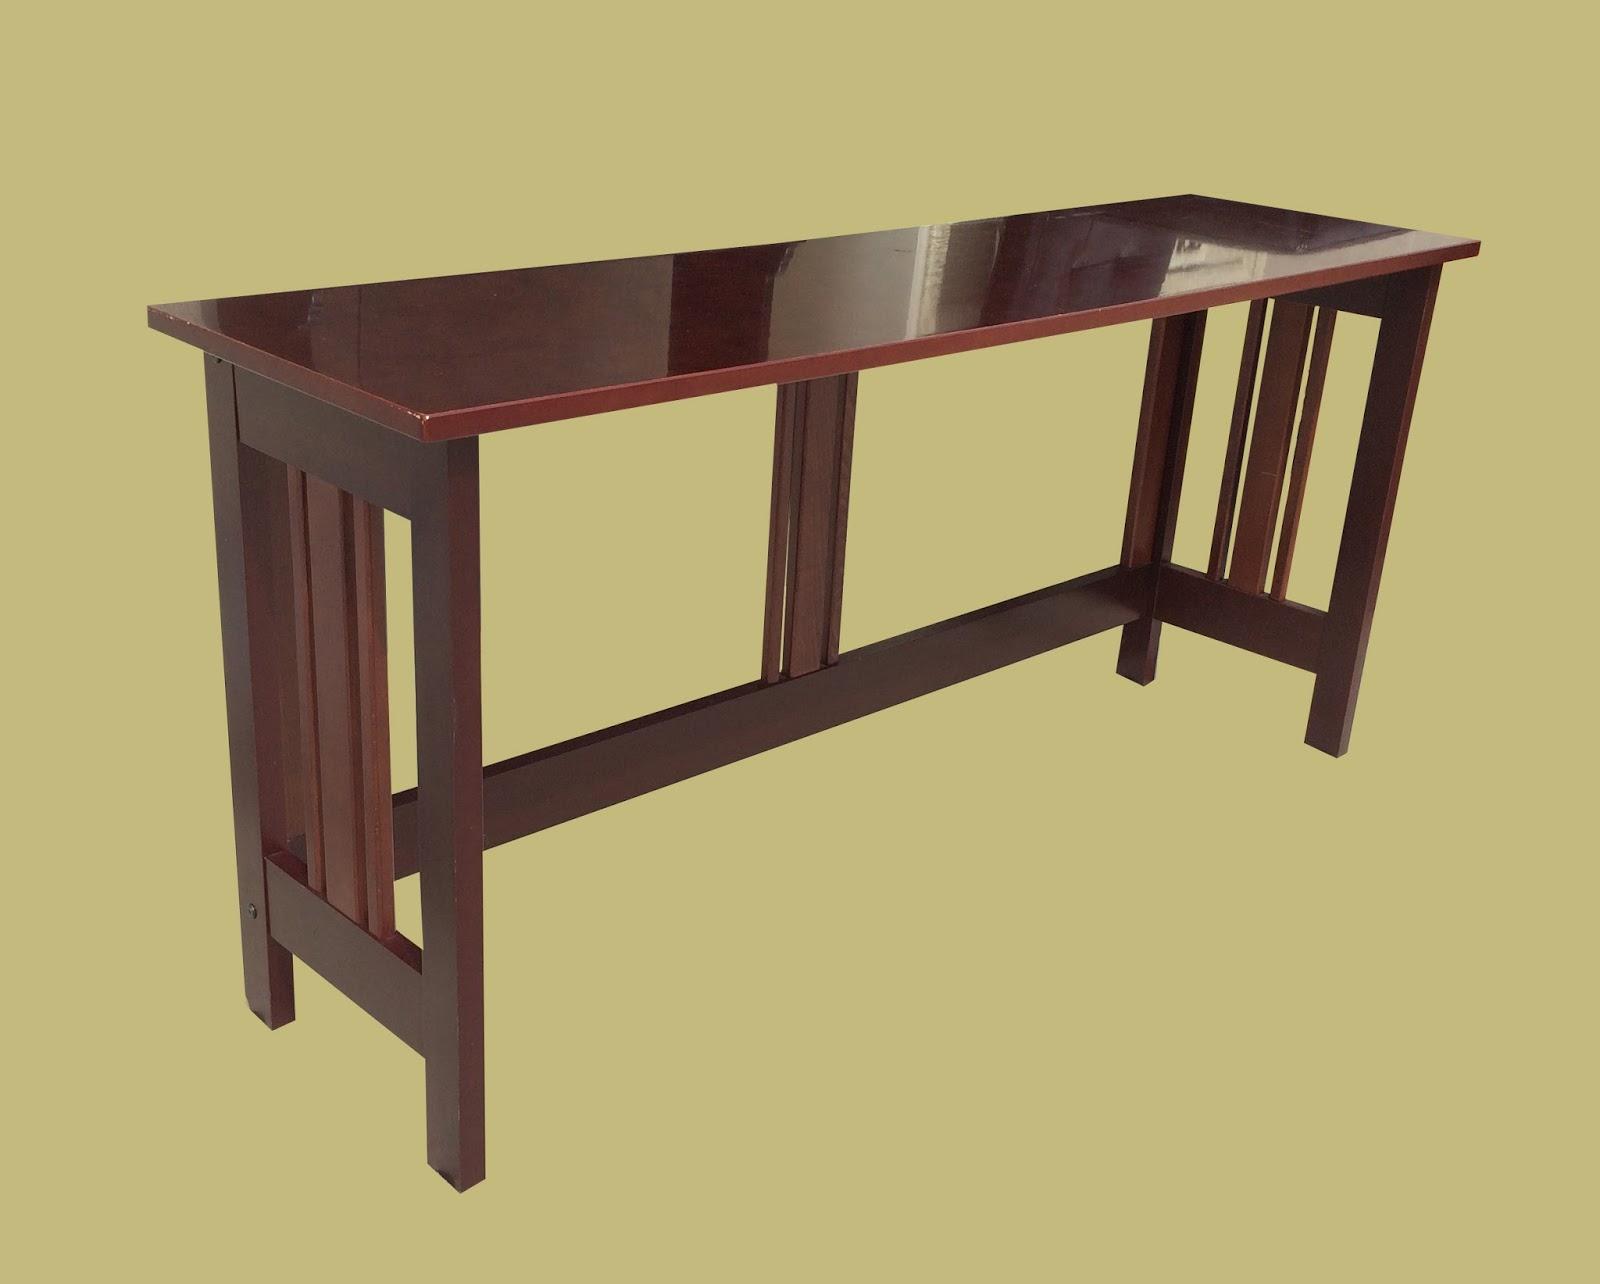 Uhuru furniture collectibles espresso color narrow for 65 sofa table